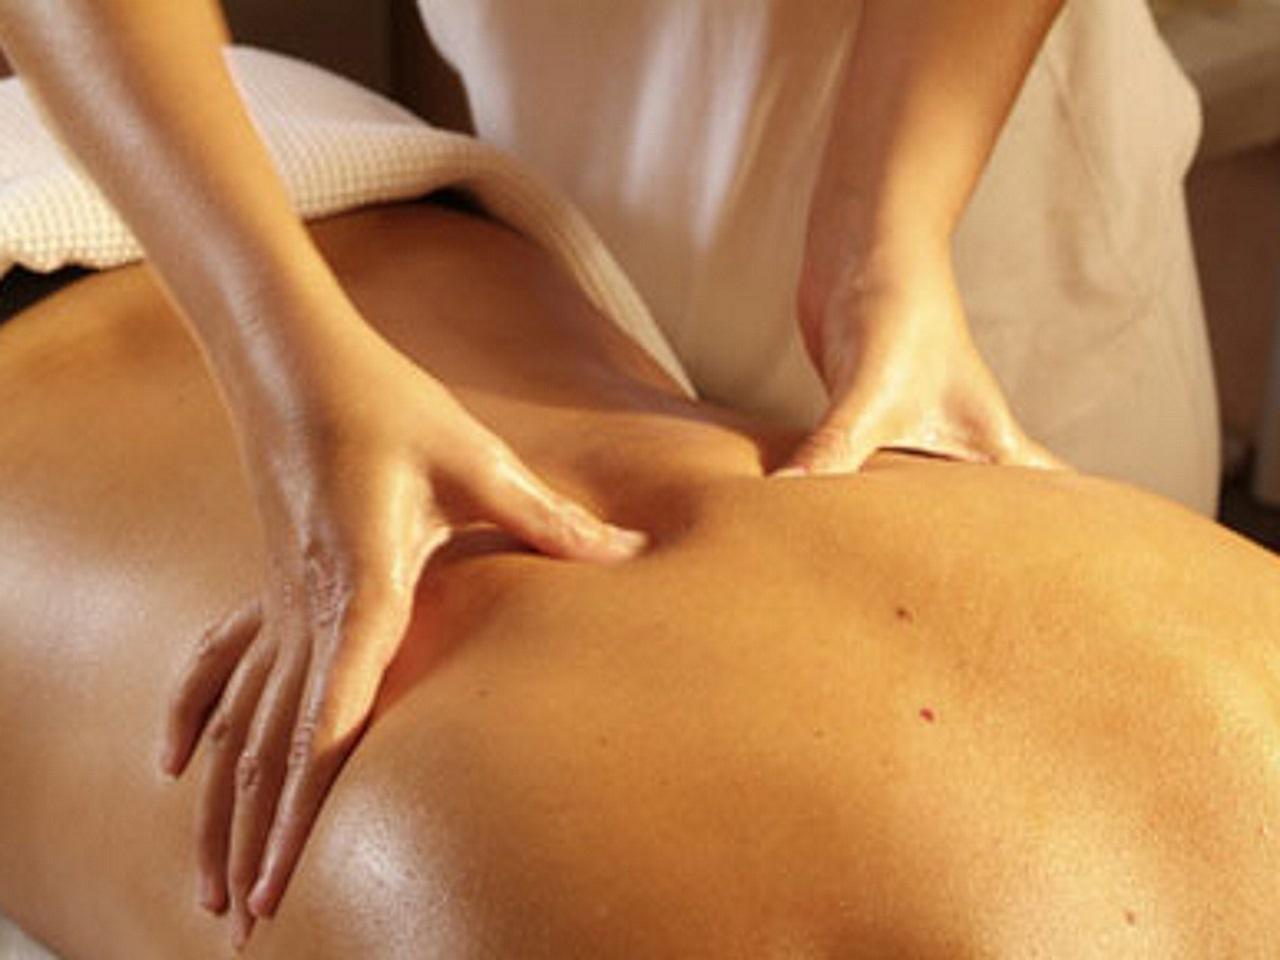 massage erotique chinois lyon coqni